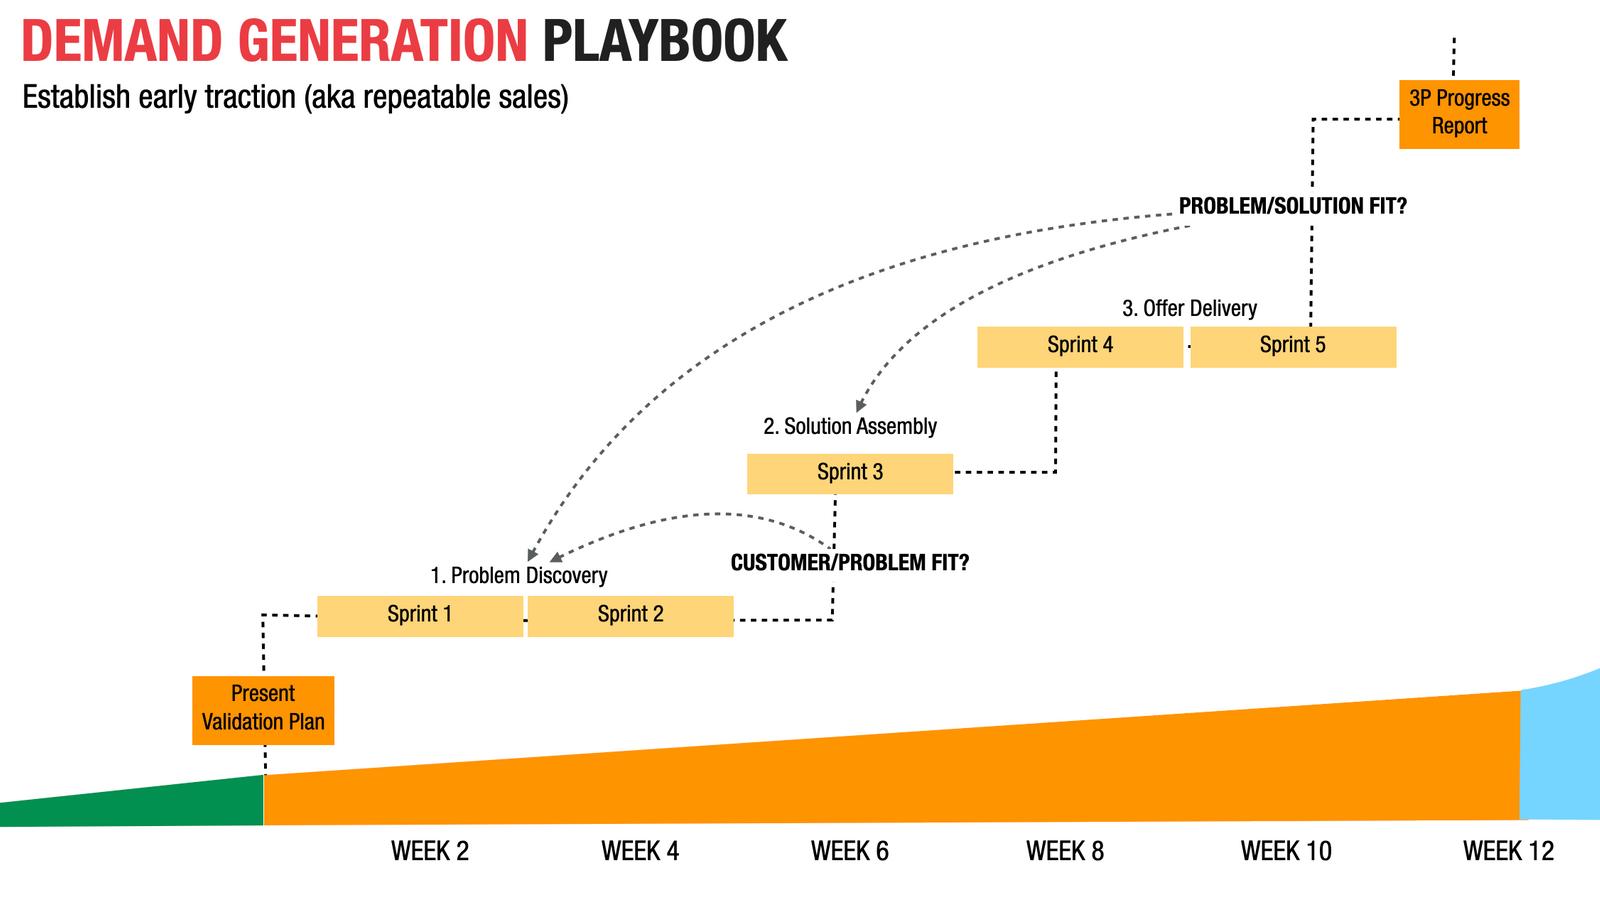 Demand Generation Playbook